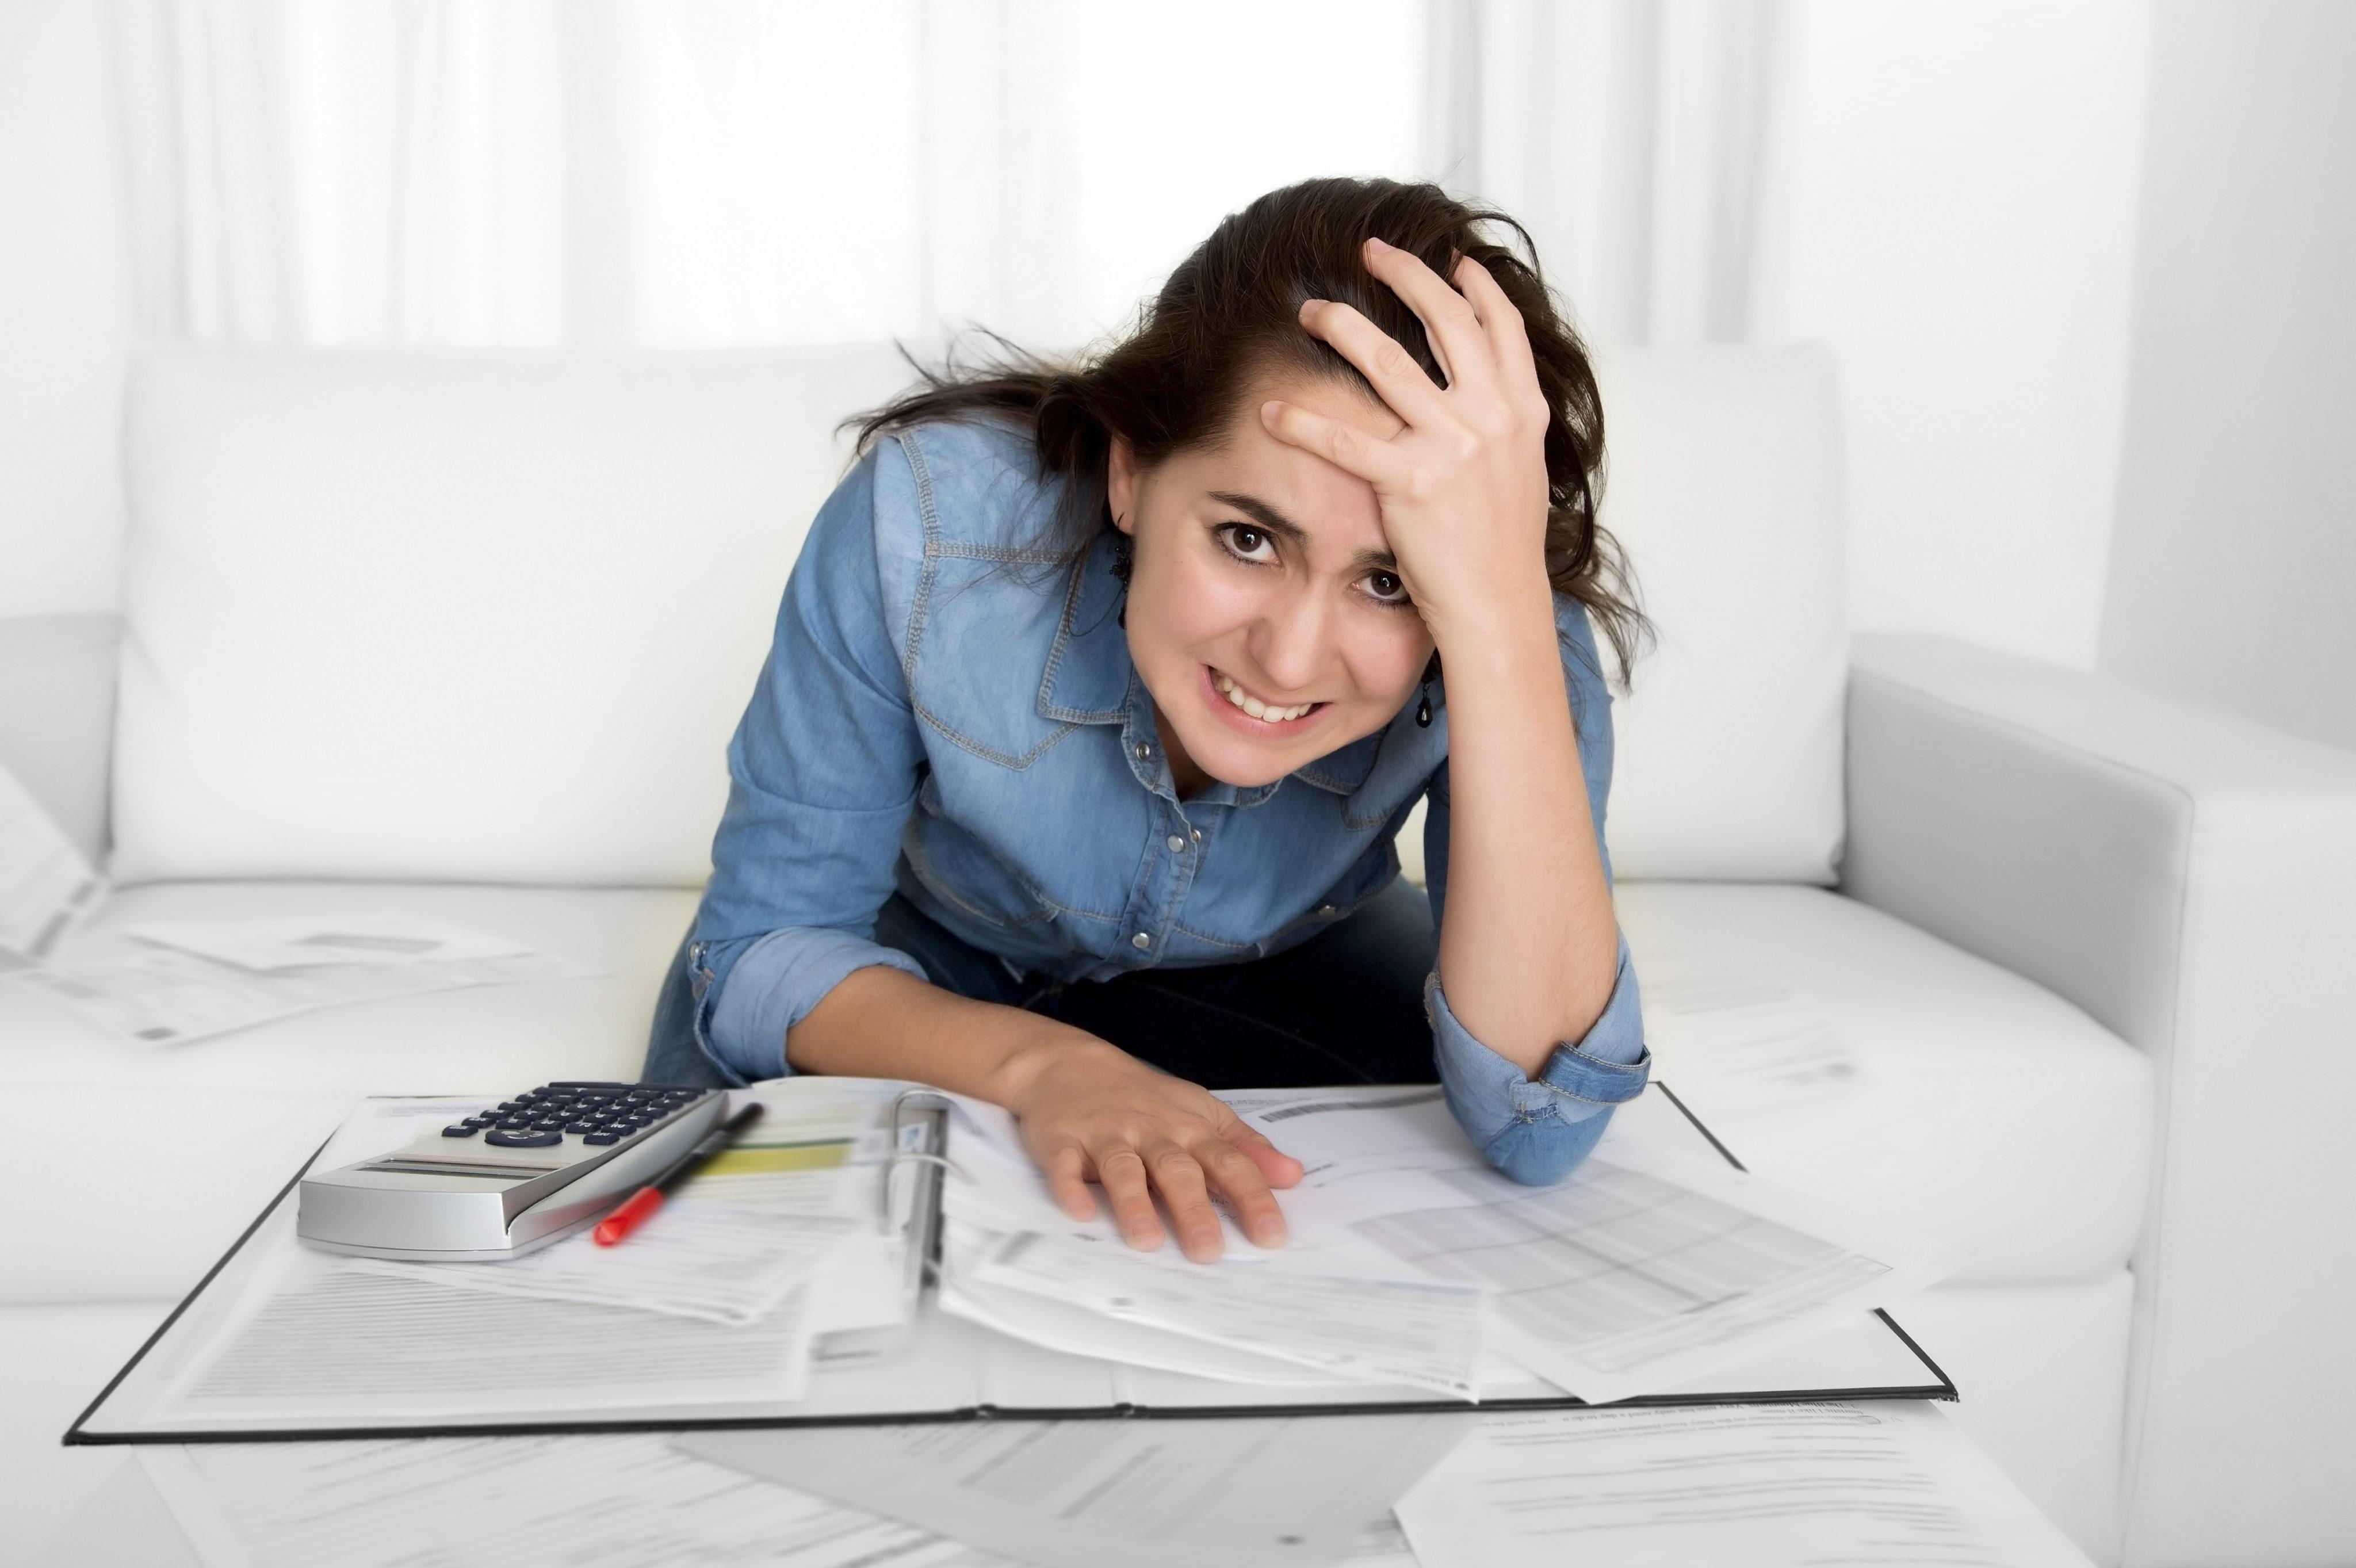 make americas finances worse - HD4096×2726